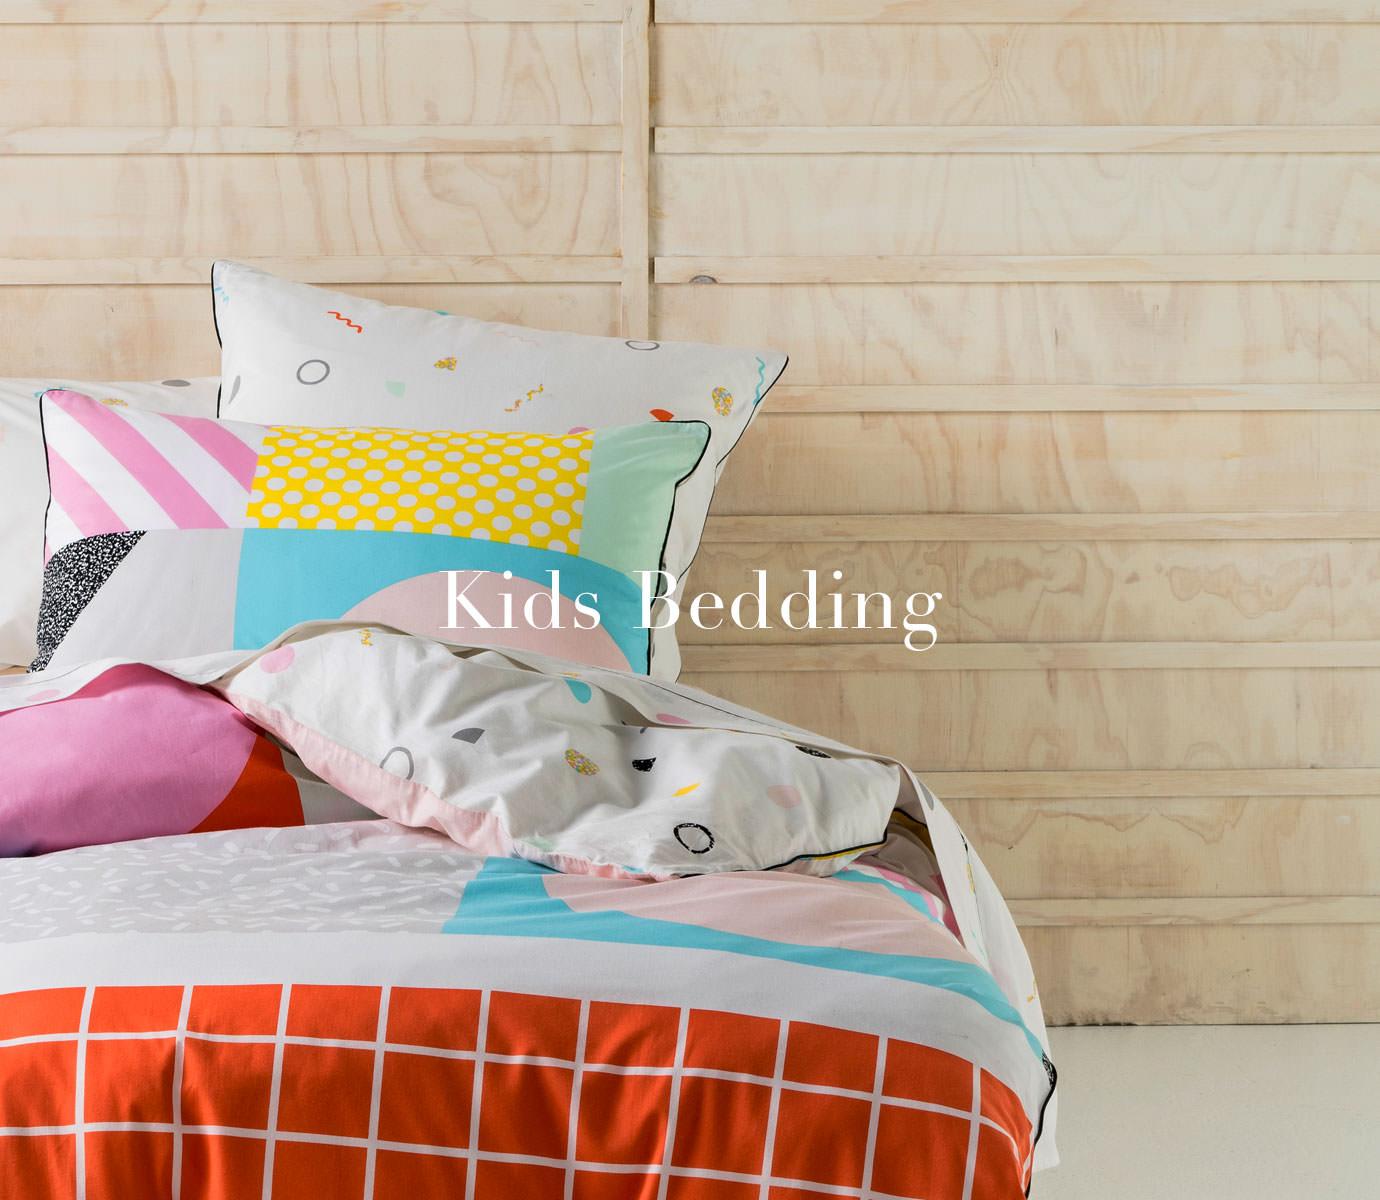 Kids Bedding Sale